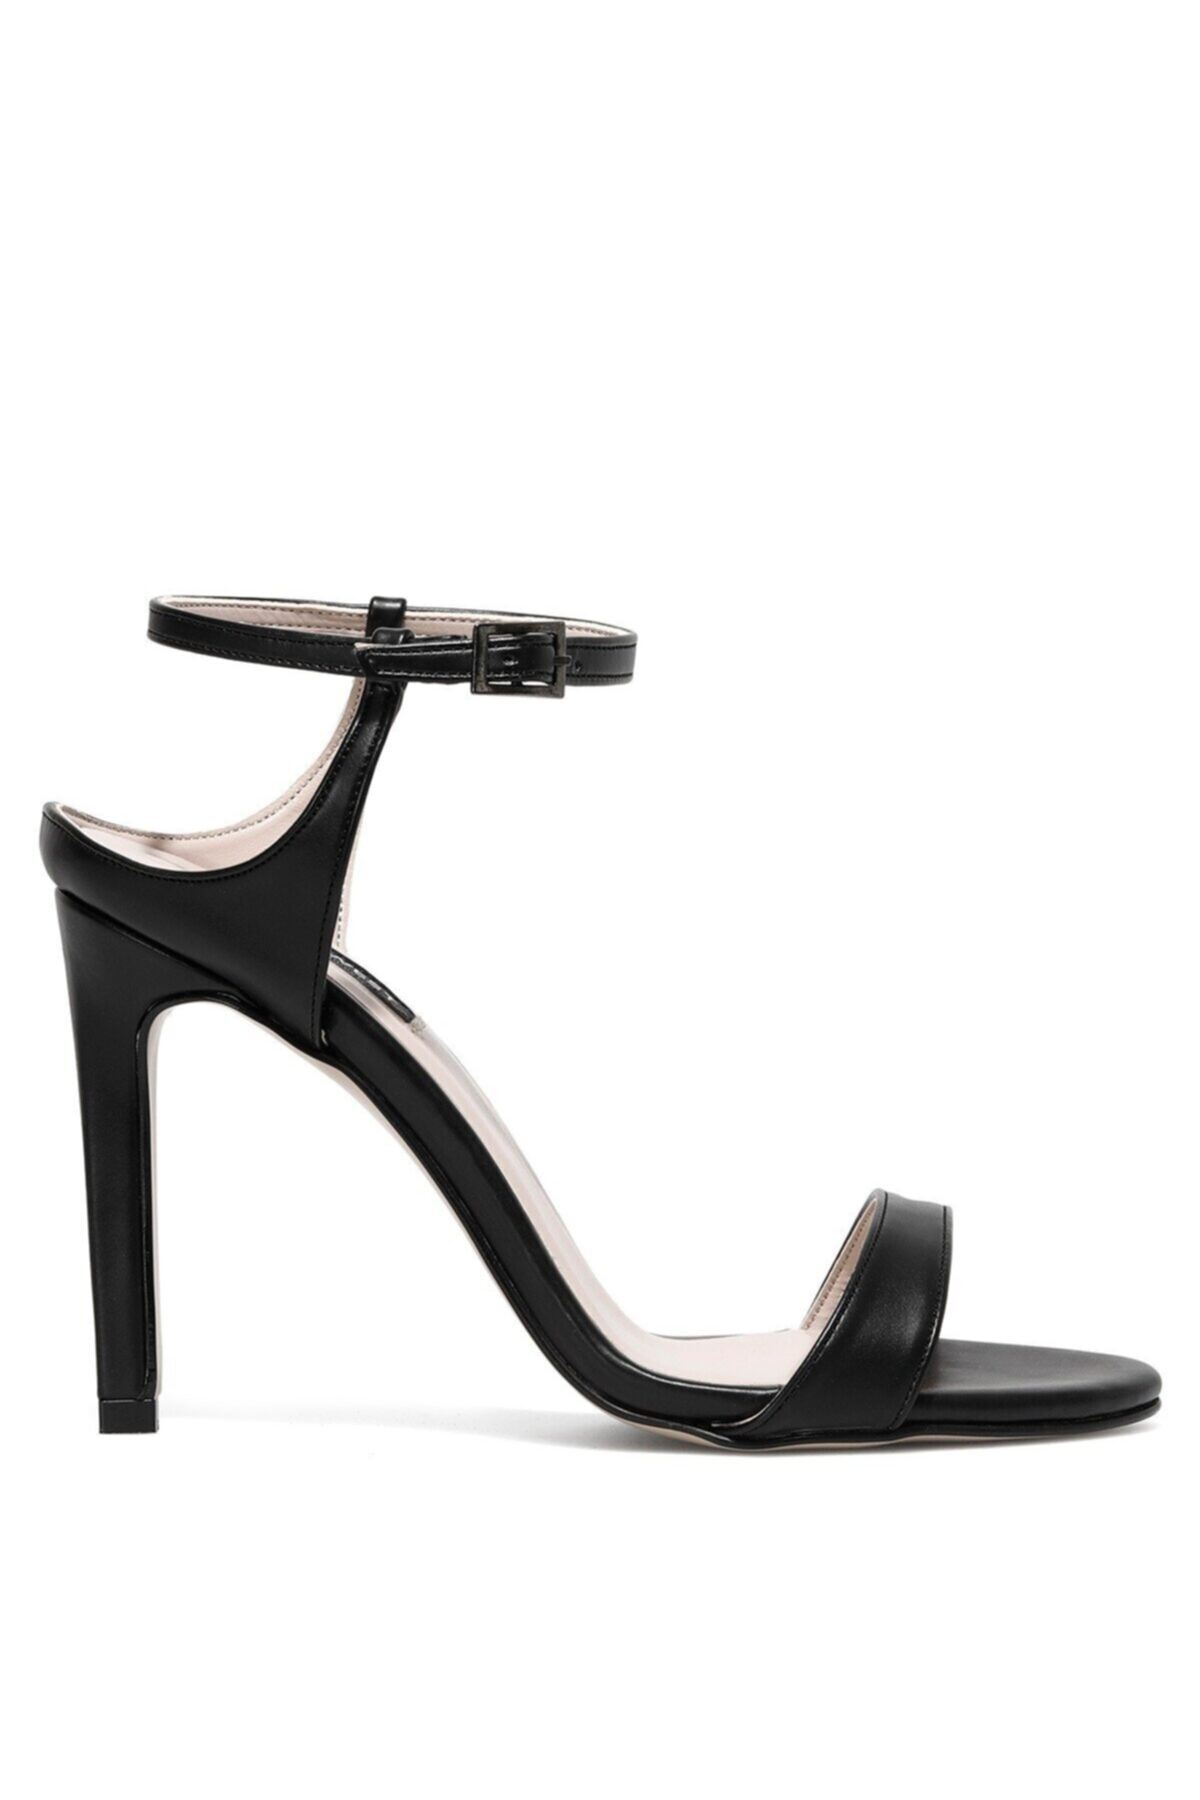 Hellema 1fx Siyah Kadın Topuklu Ayakkabı